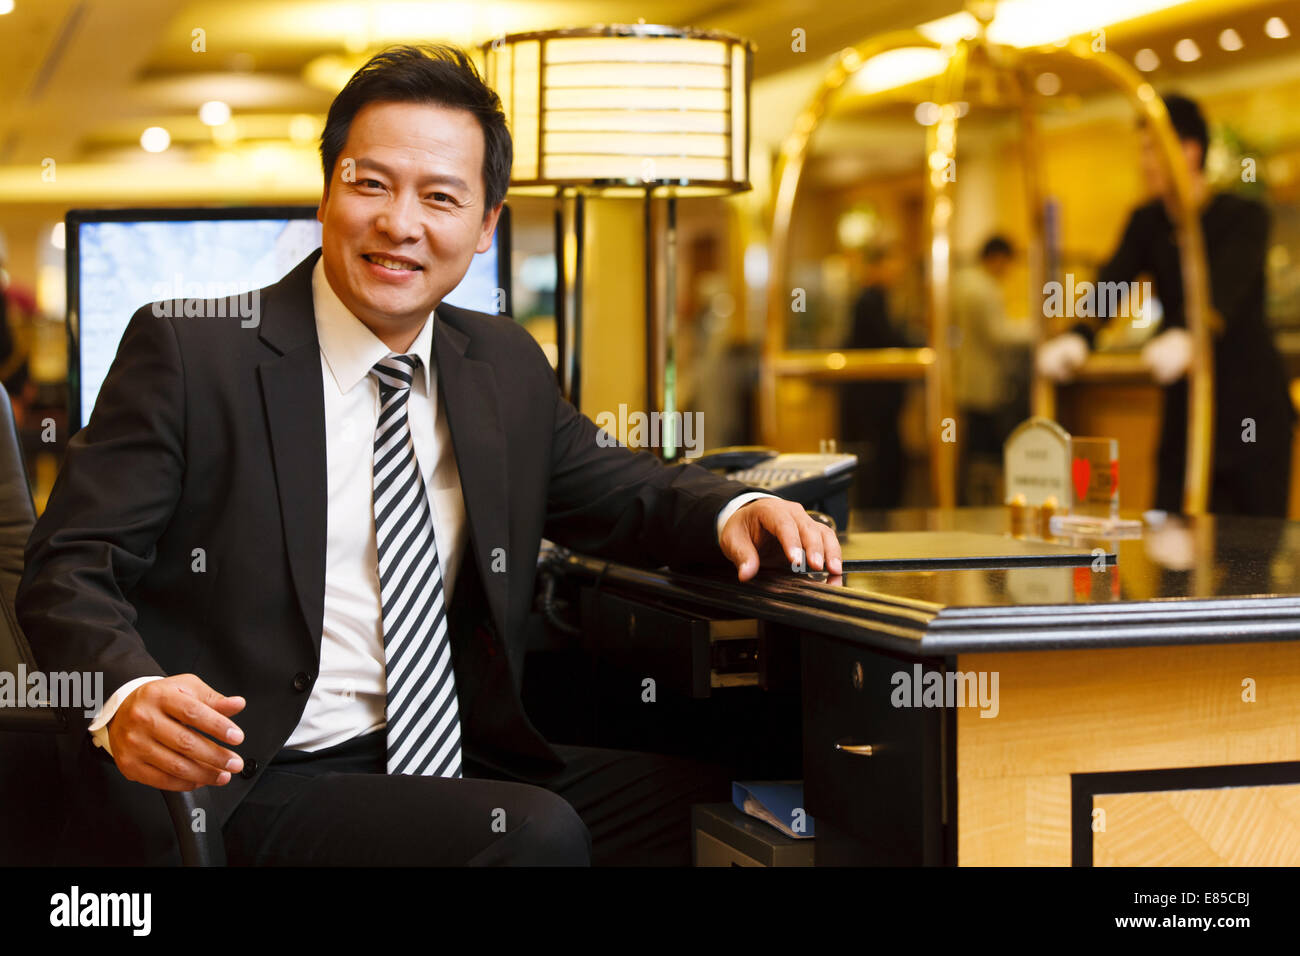 Portrait of hotel service staff - Stock Image